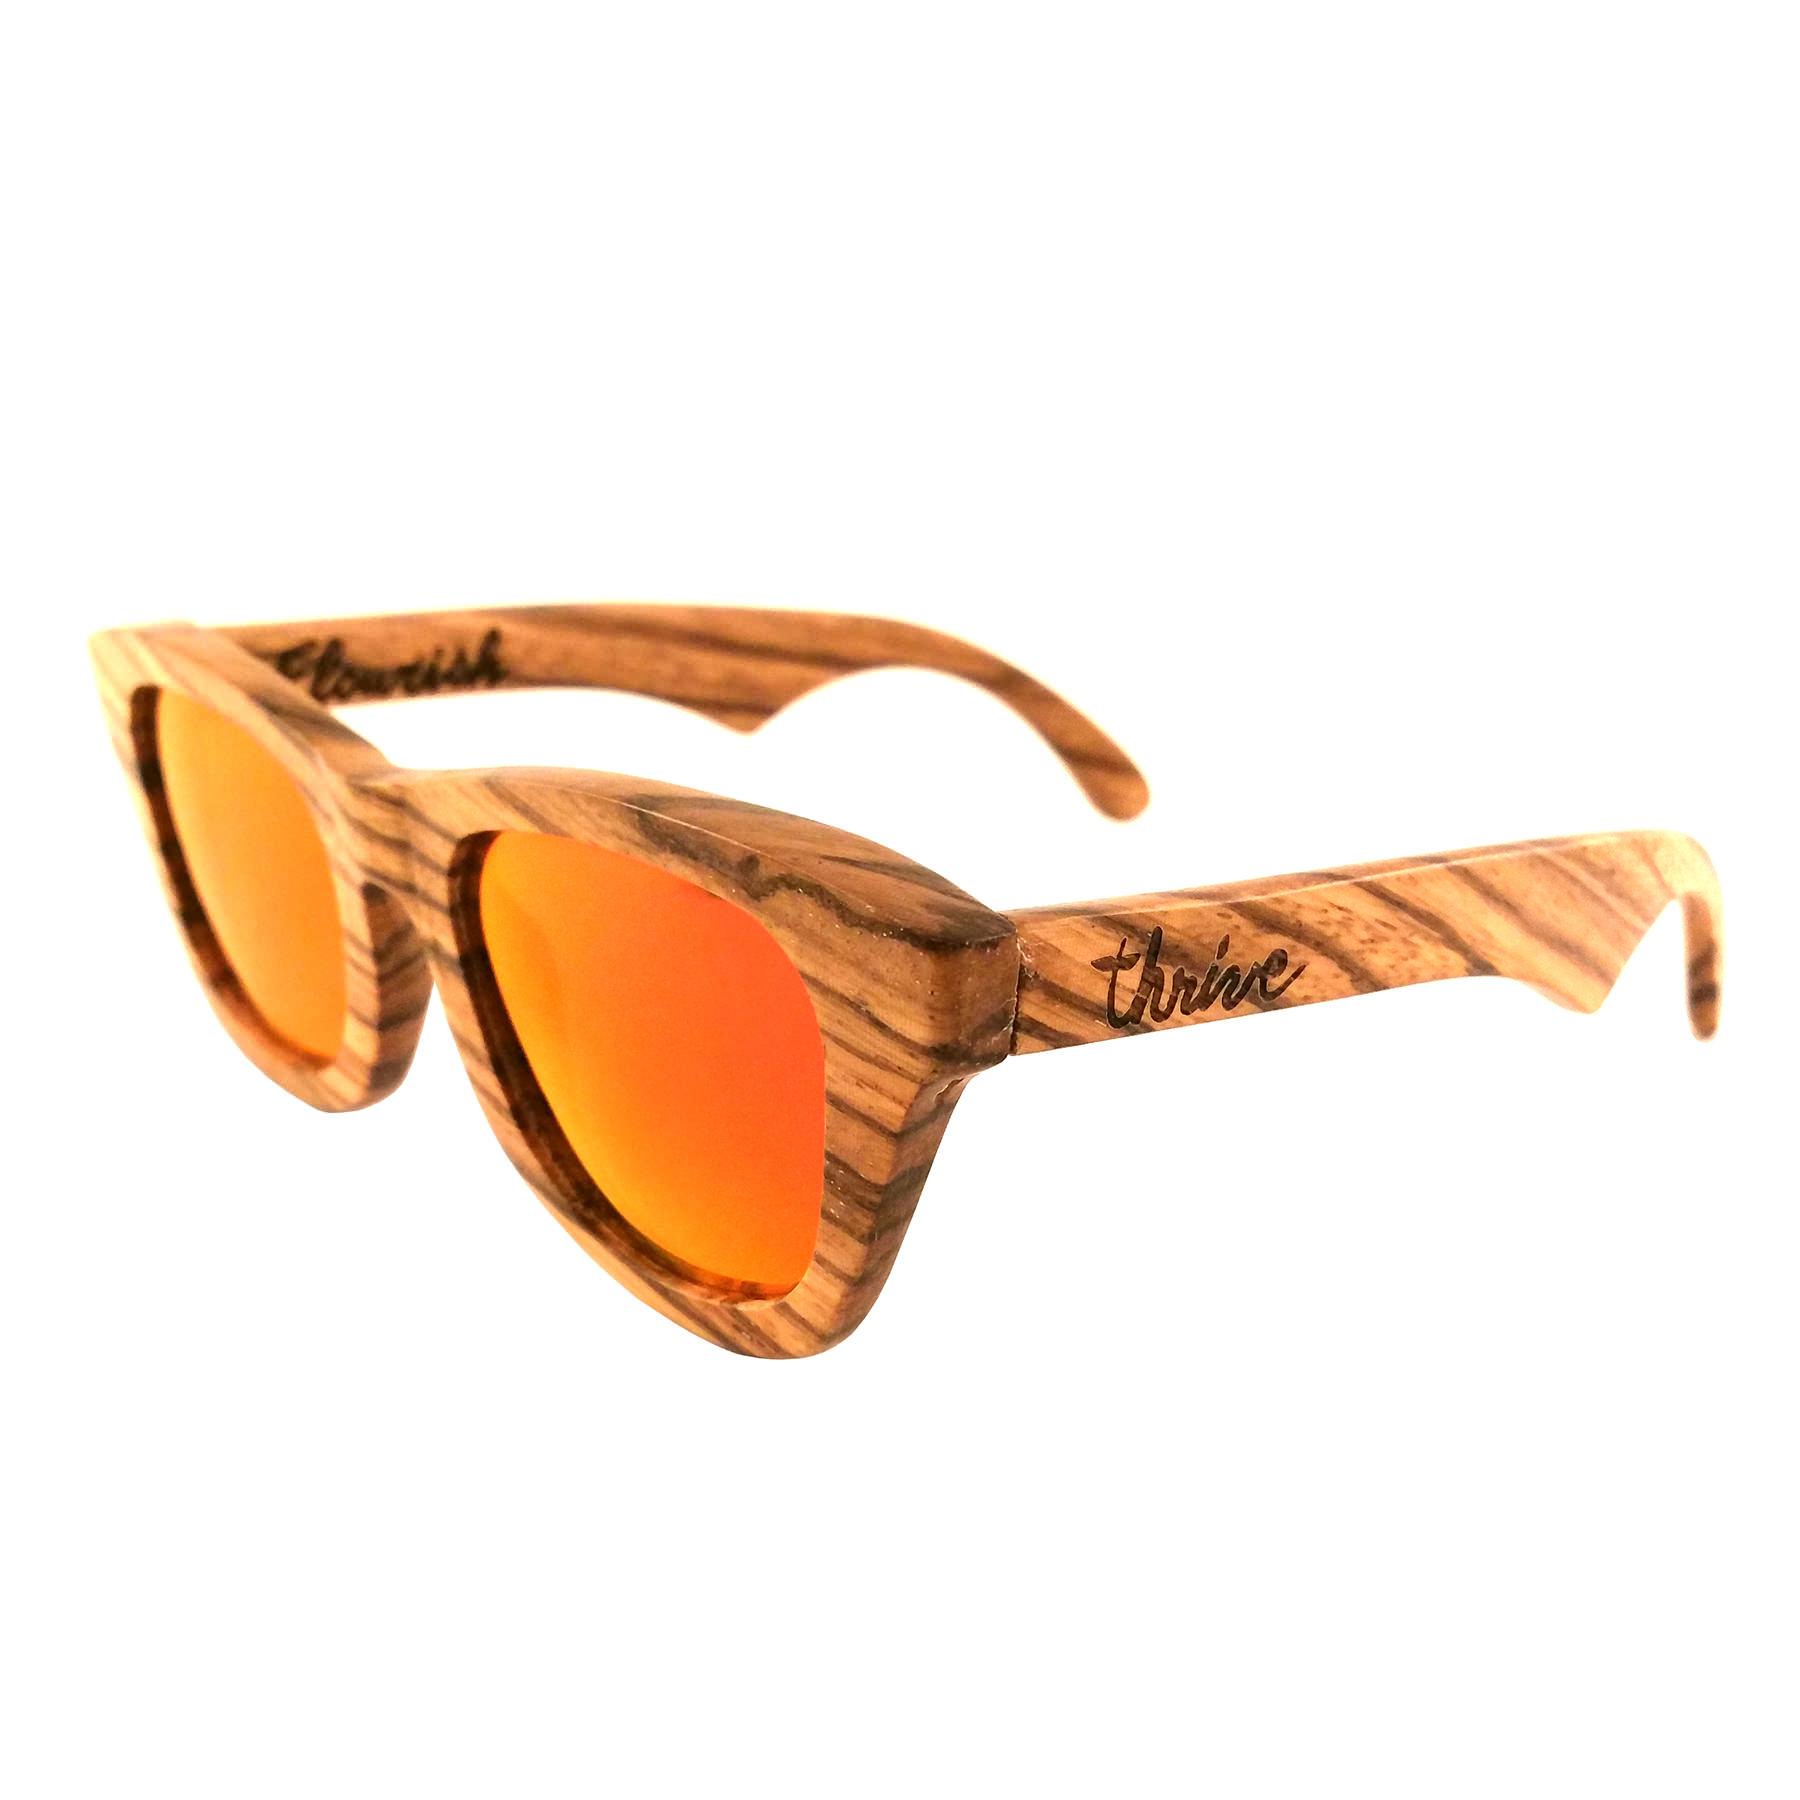 Zebra Wood Frames - Red Polarized Lenses - Thrive Shades